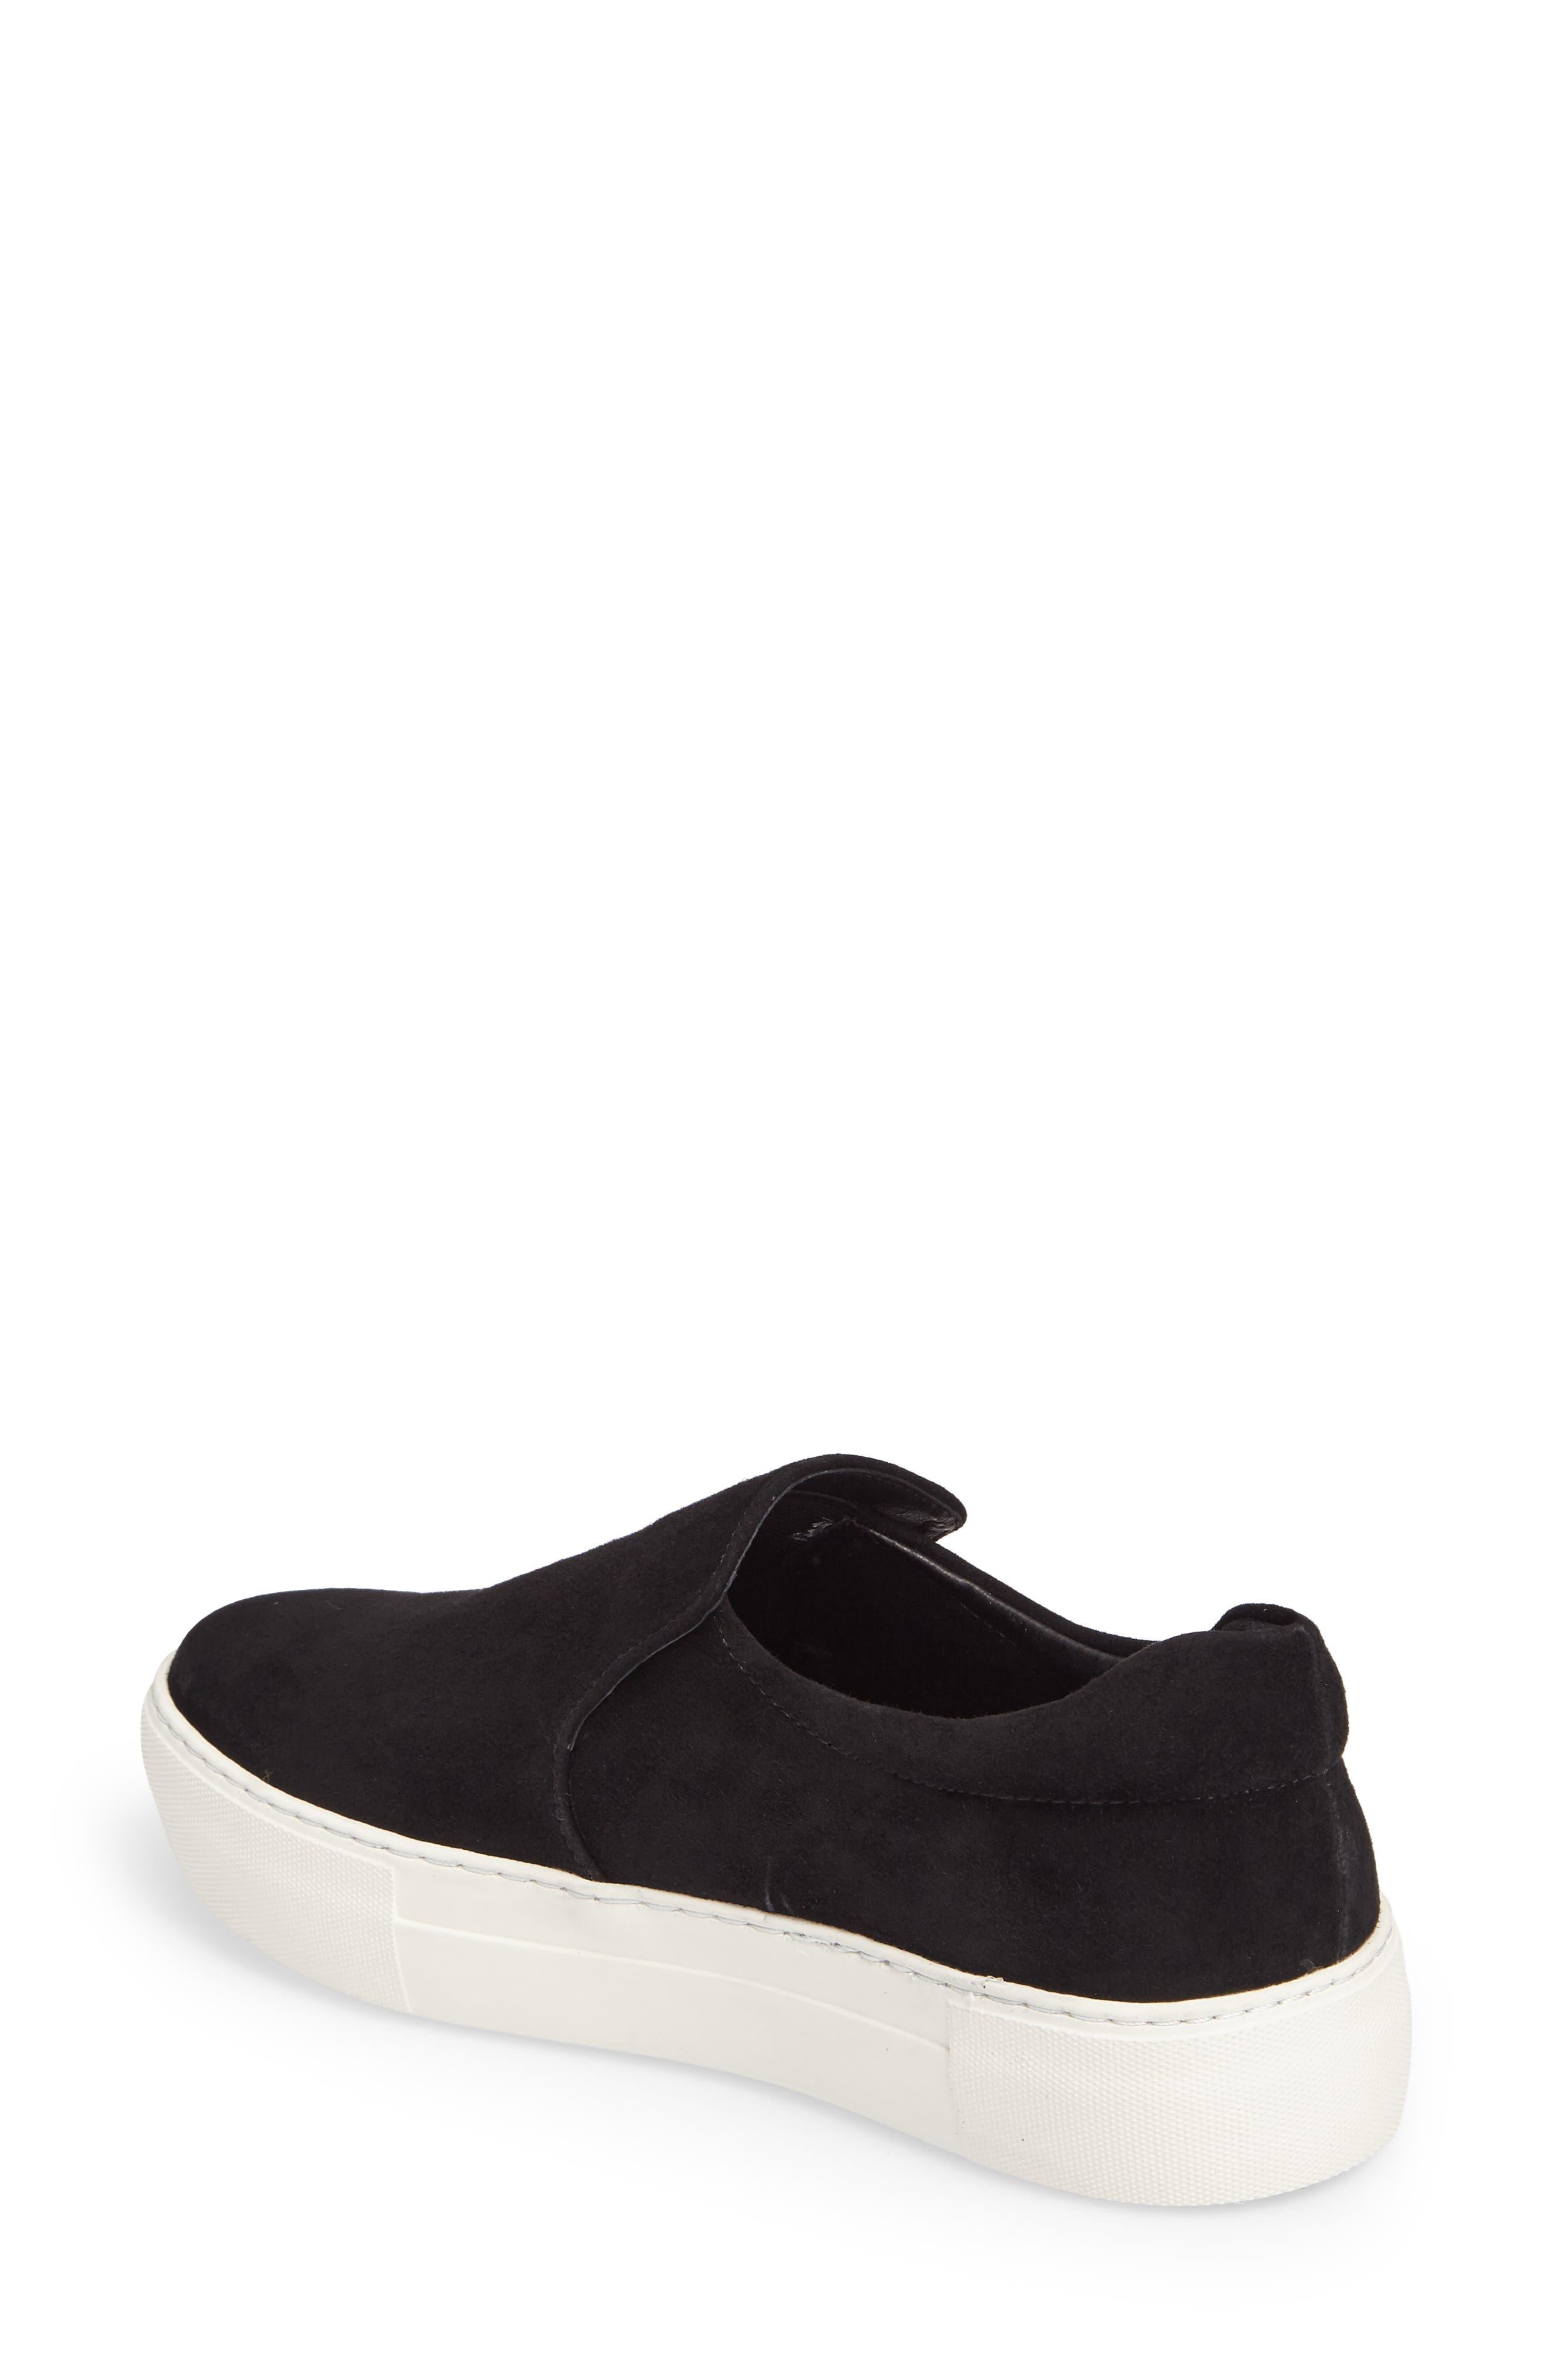 Acer Slip-On Sneaker,                             Alternate thumbnail 2, color,                             BLACK SUEDE